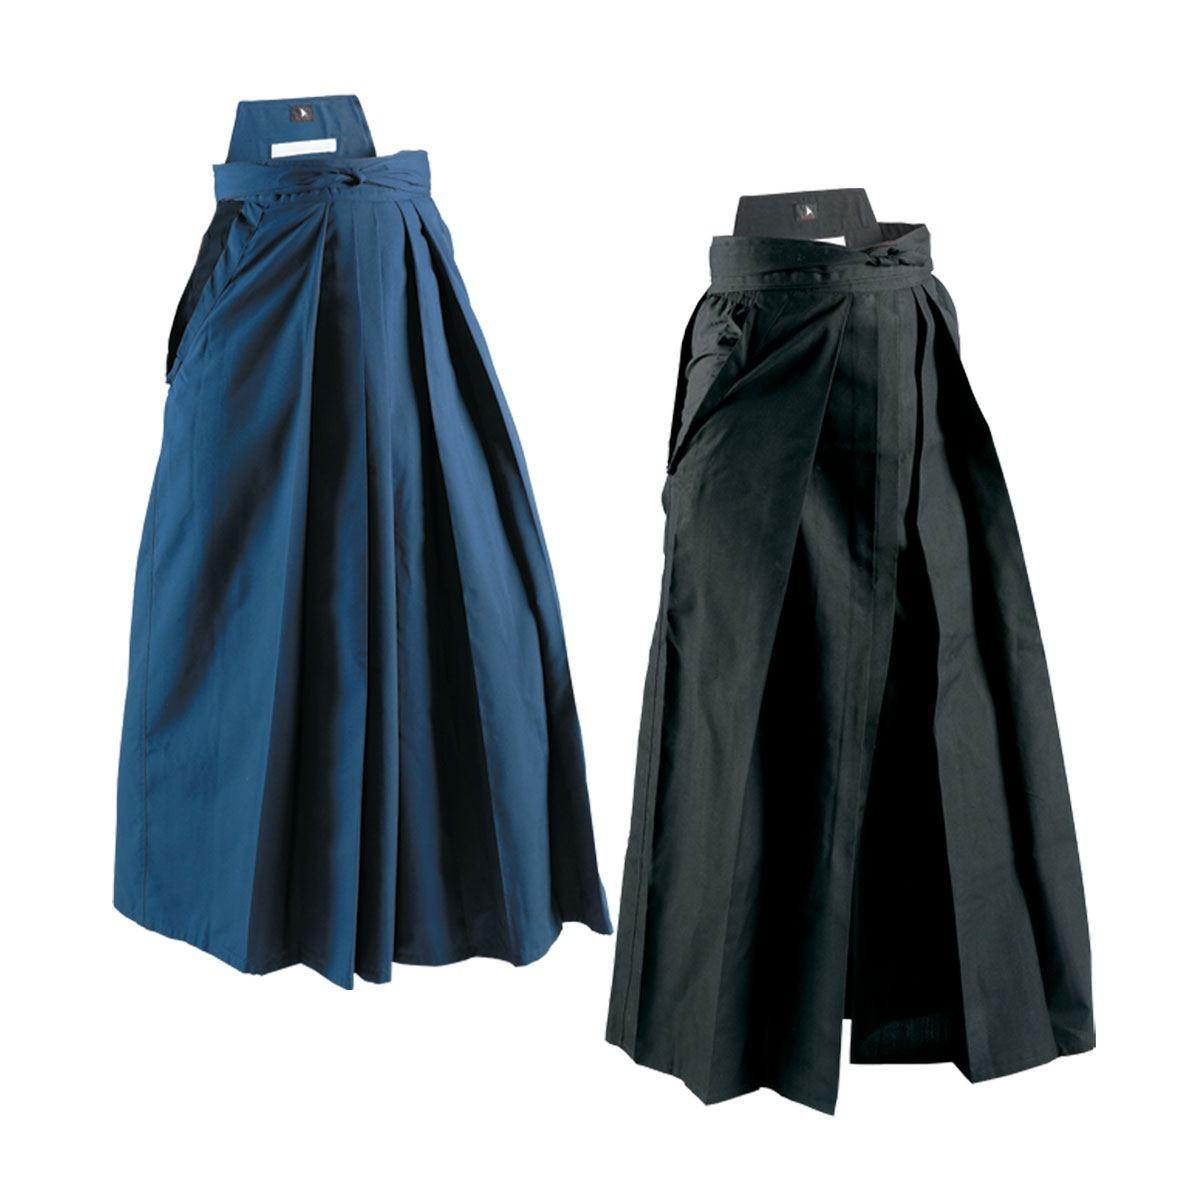 Hakama Martial Arts Karate Pants